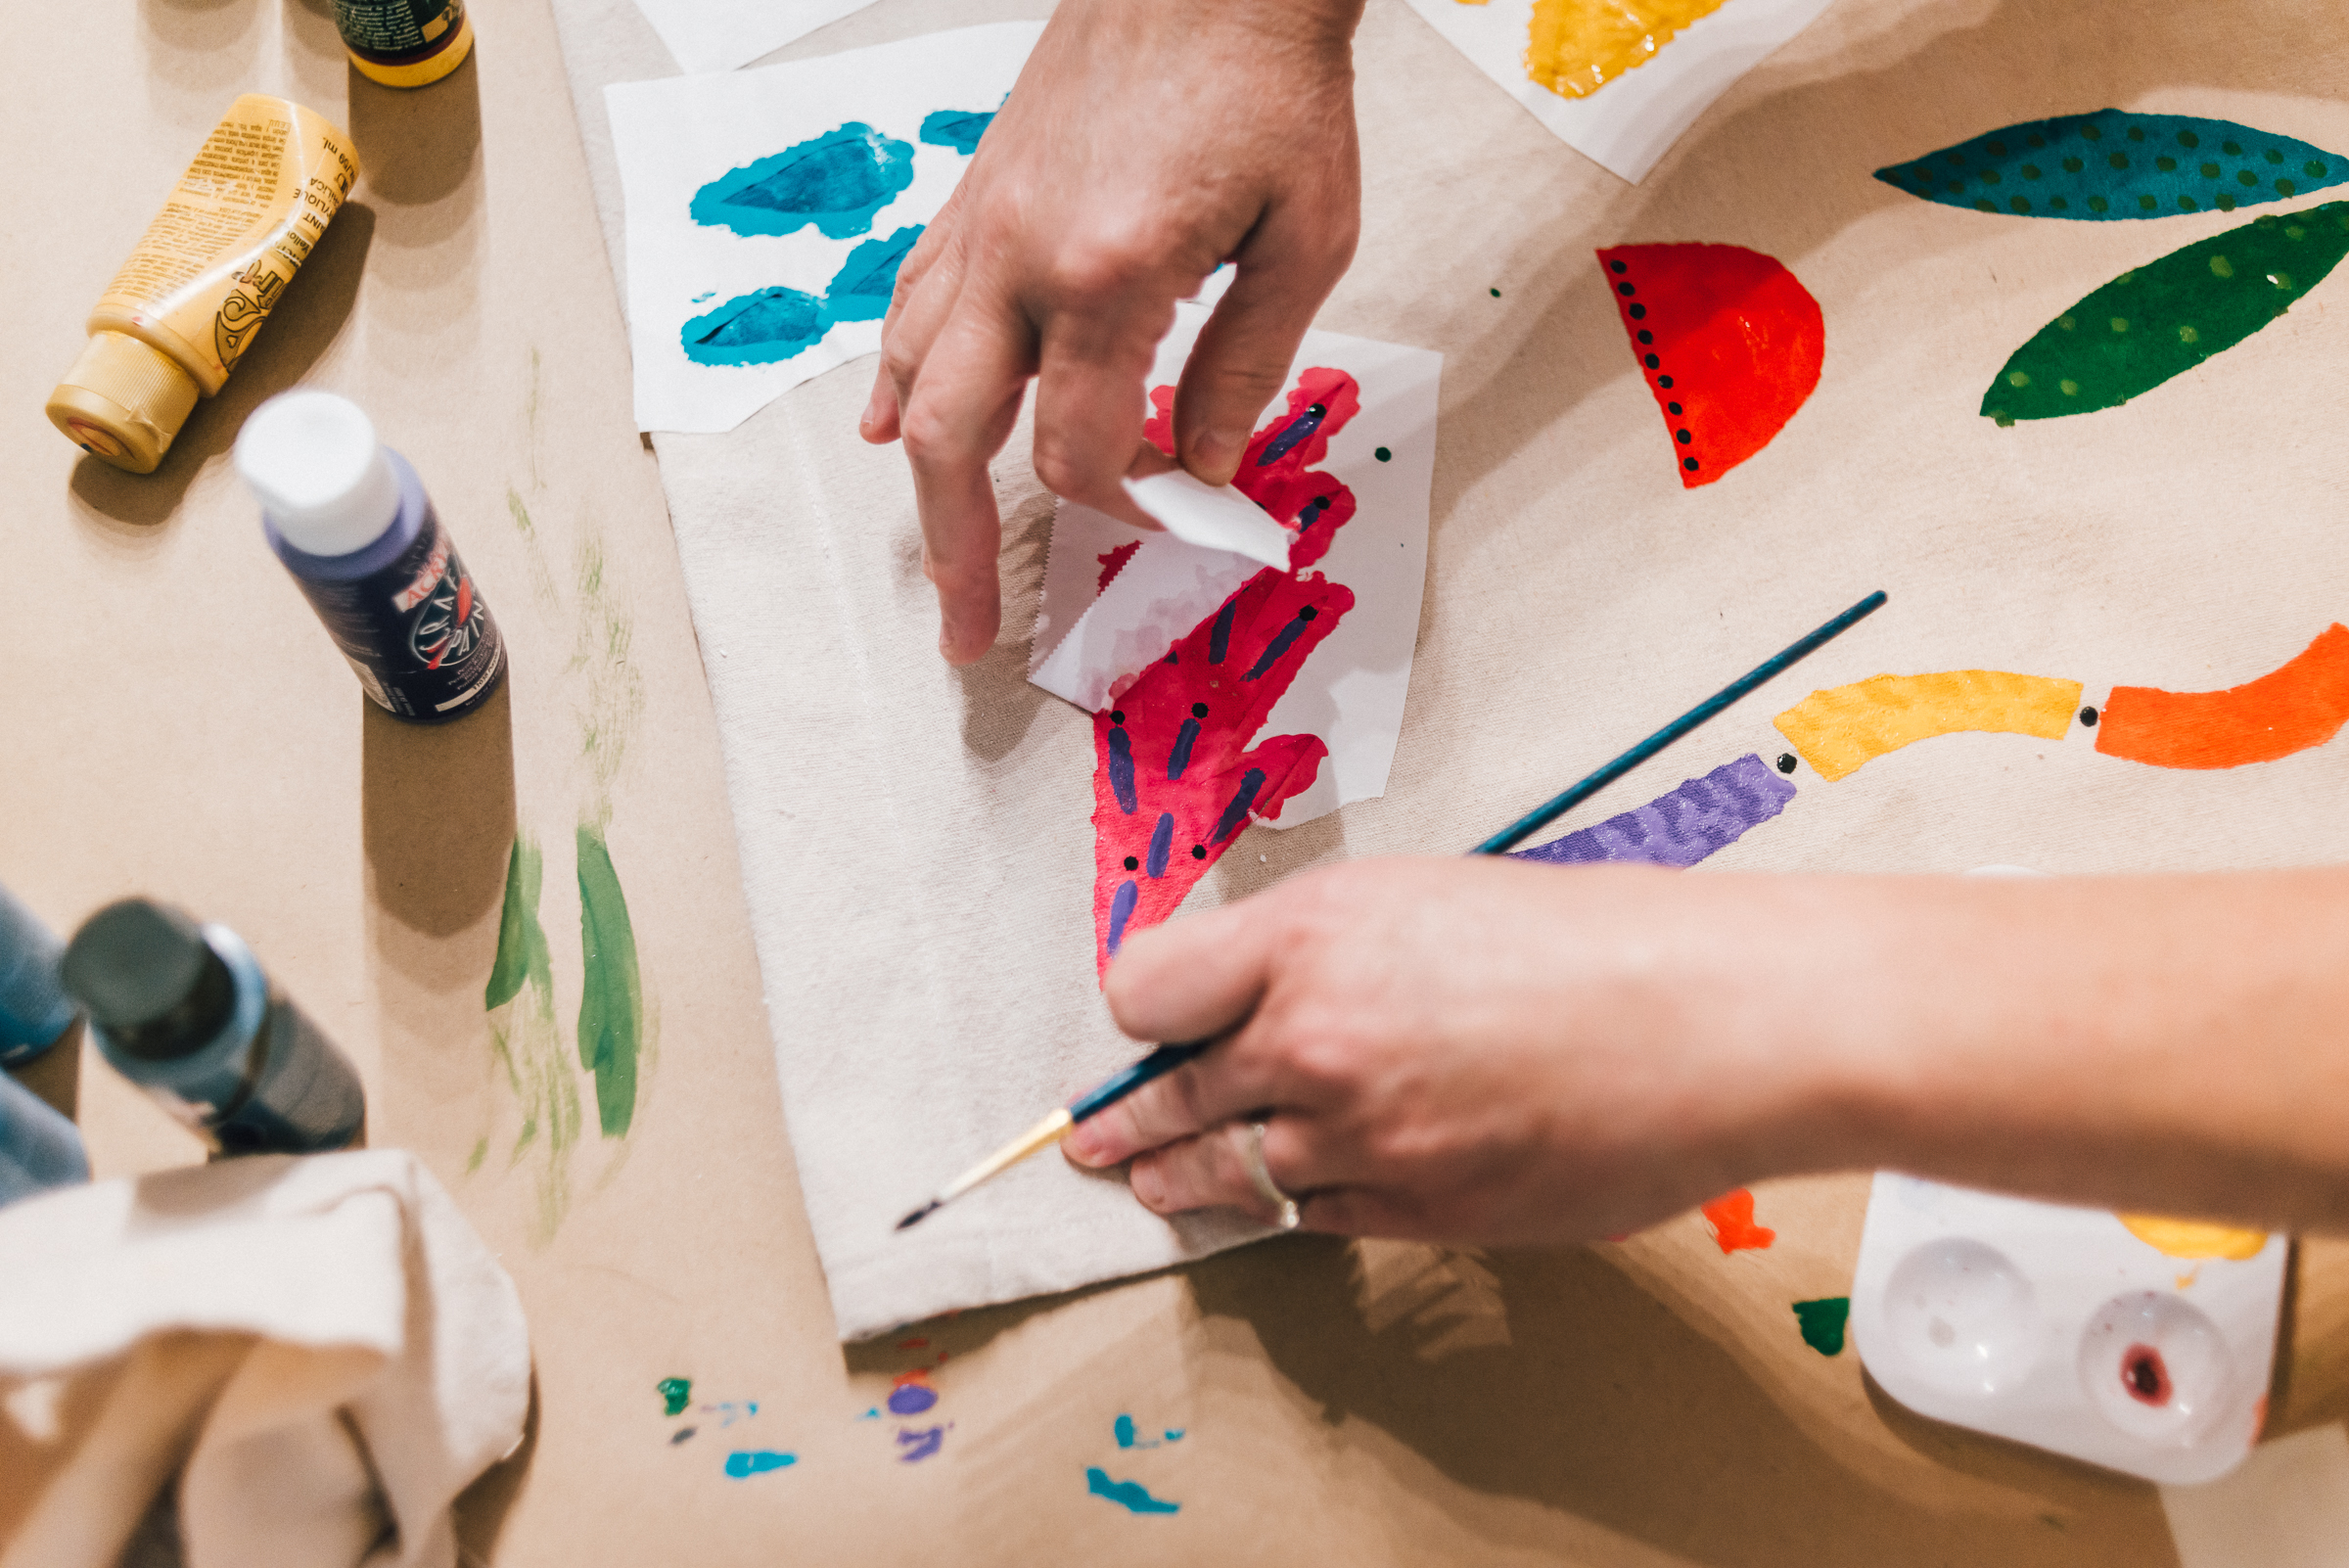 PaintedWallTapestryWorkshop_LightGalleryGR-7.jpg